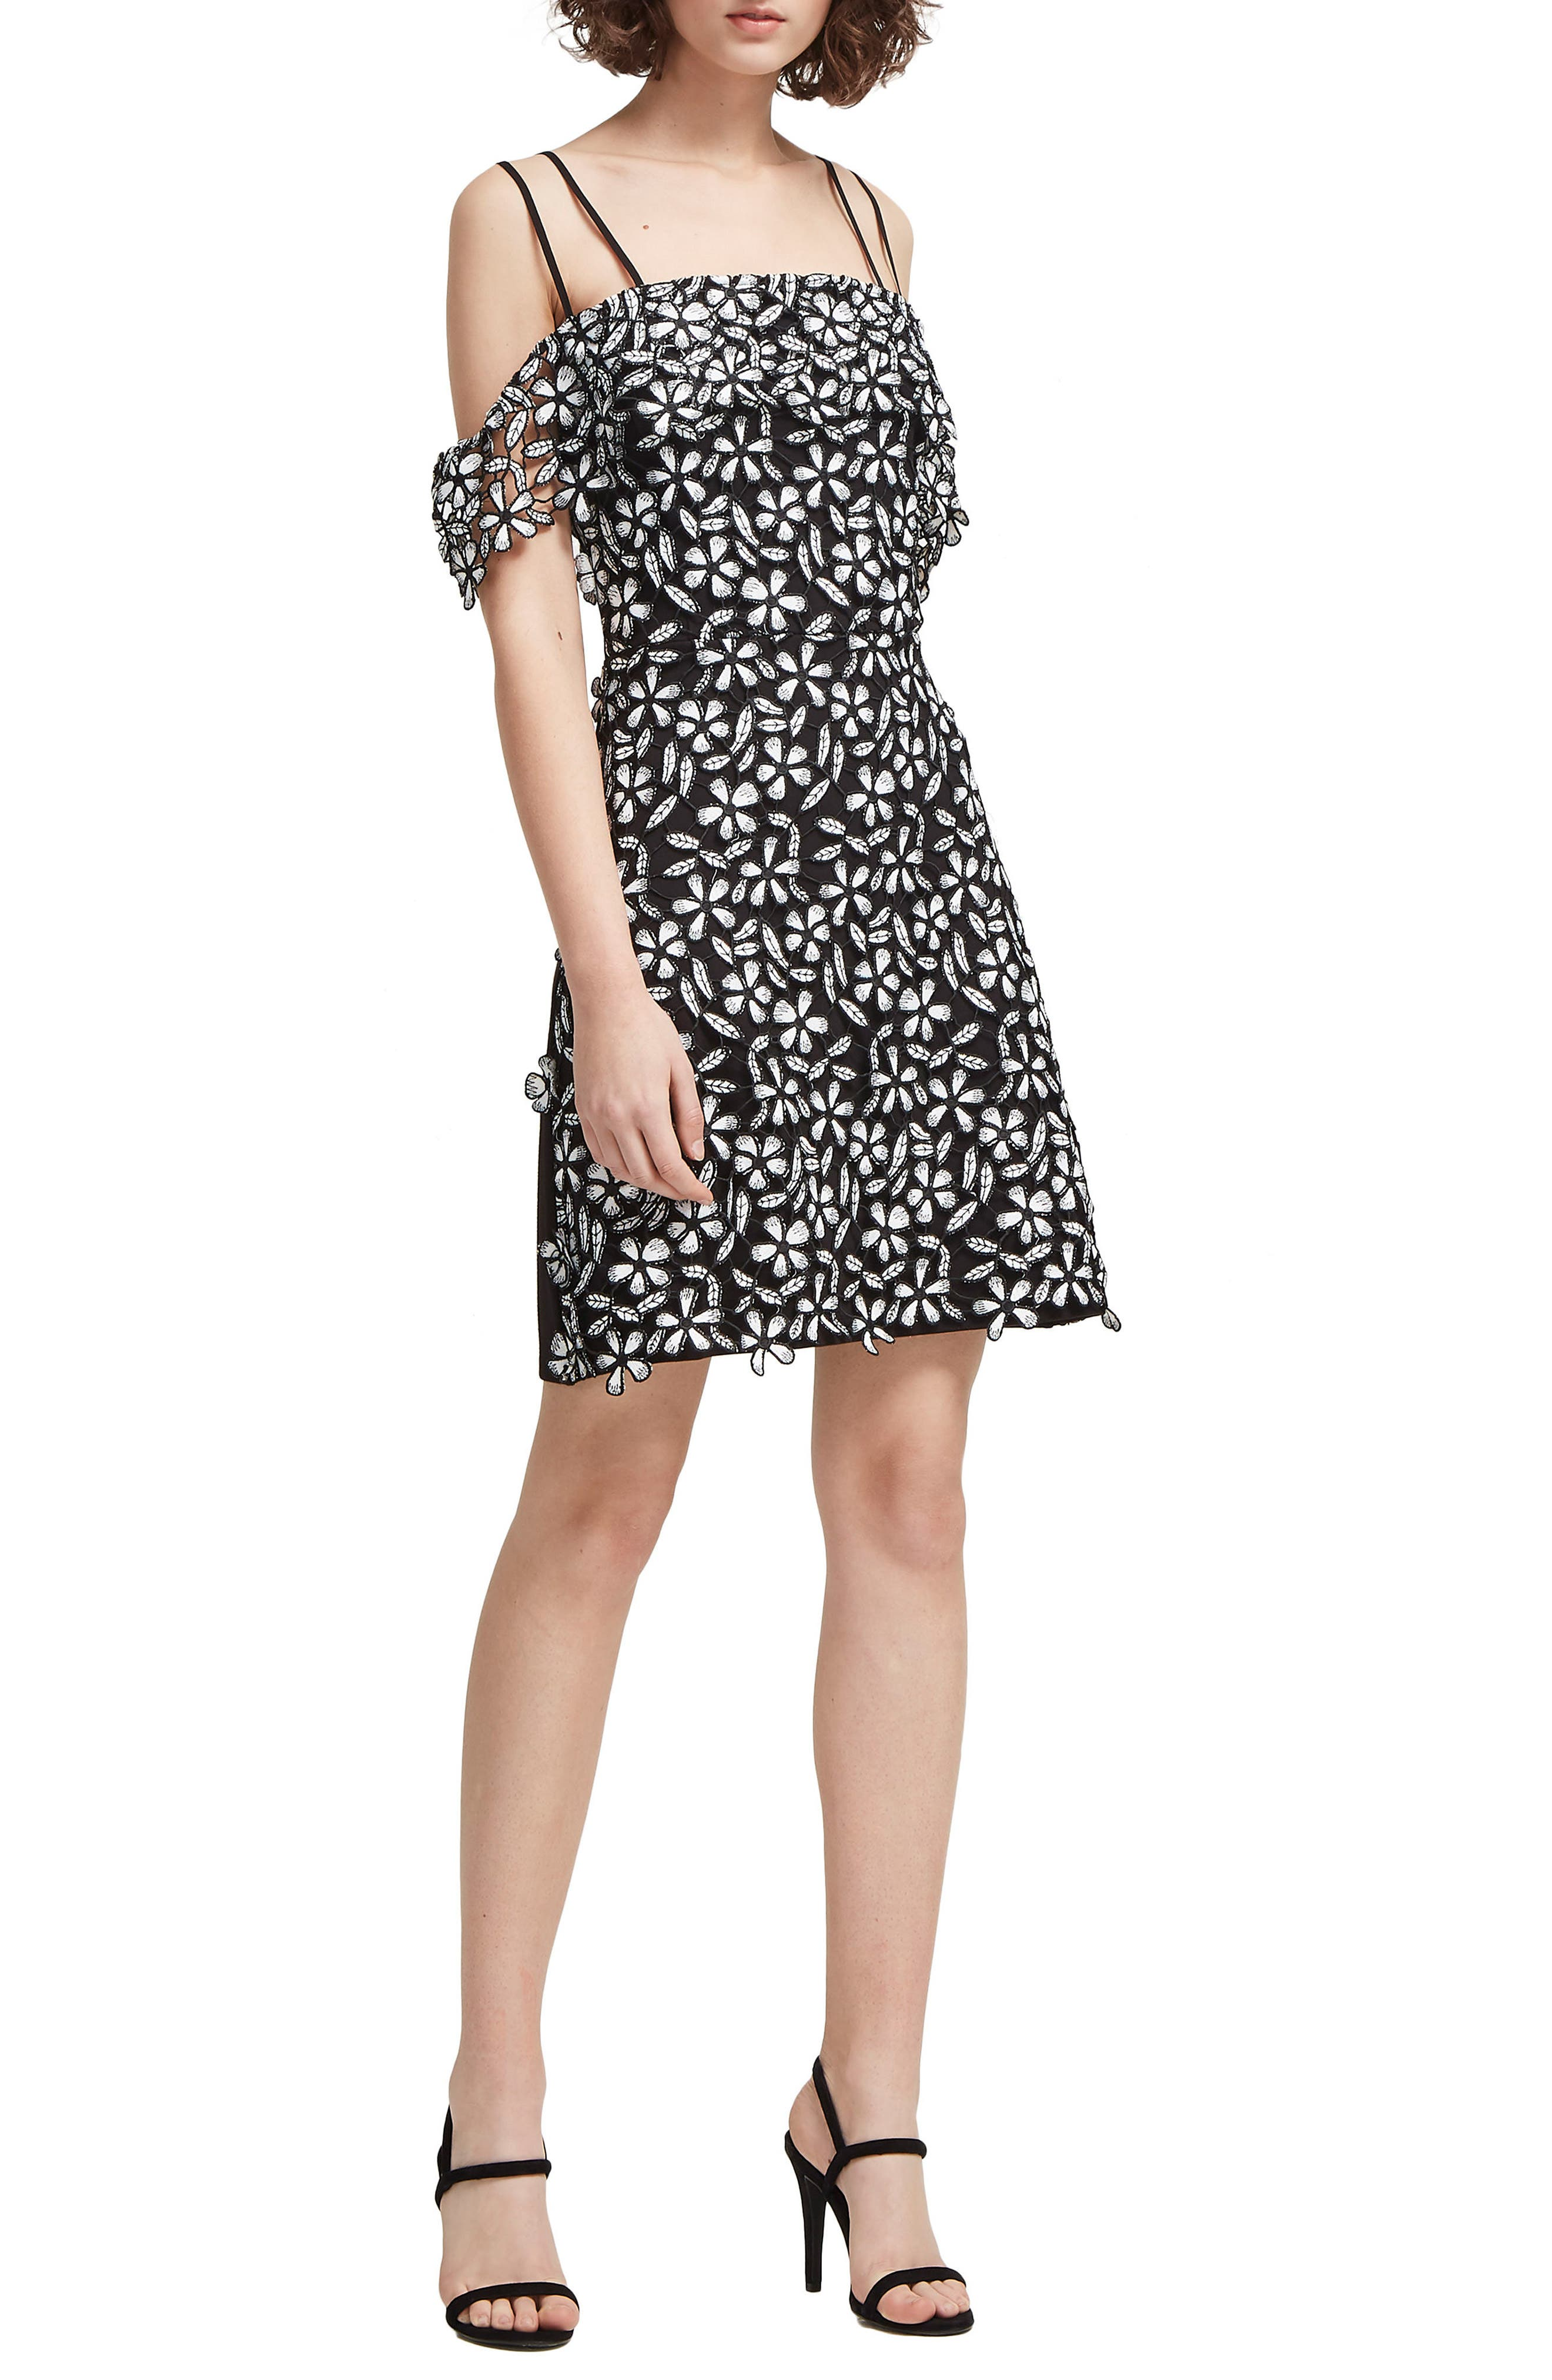 Fulaga Floral Lace Cold Shoulder Dress,                             Main thumbnail 1, color,                             001